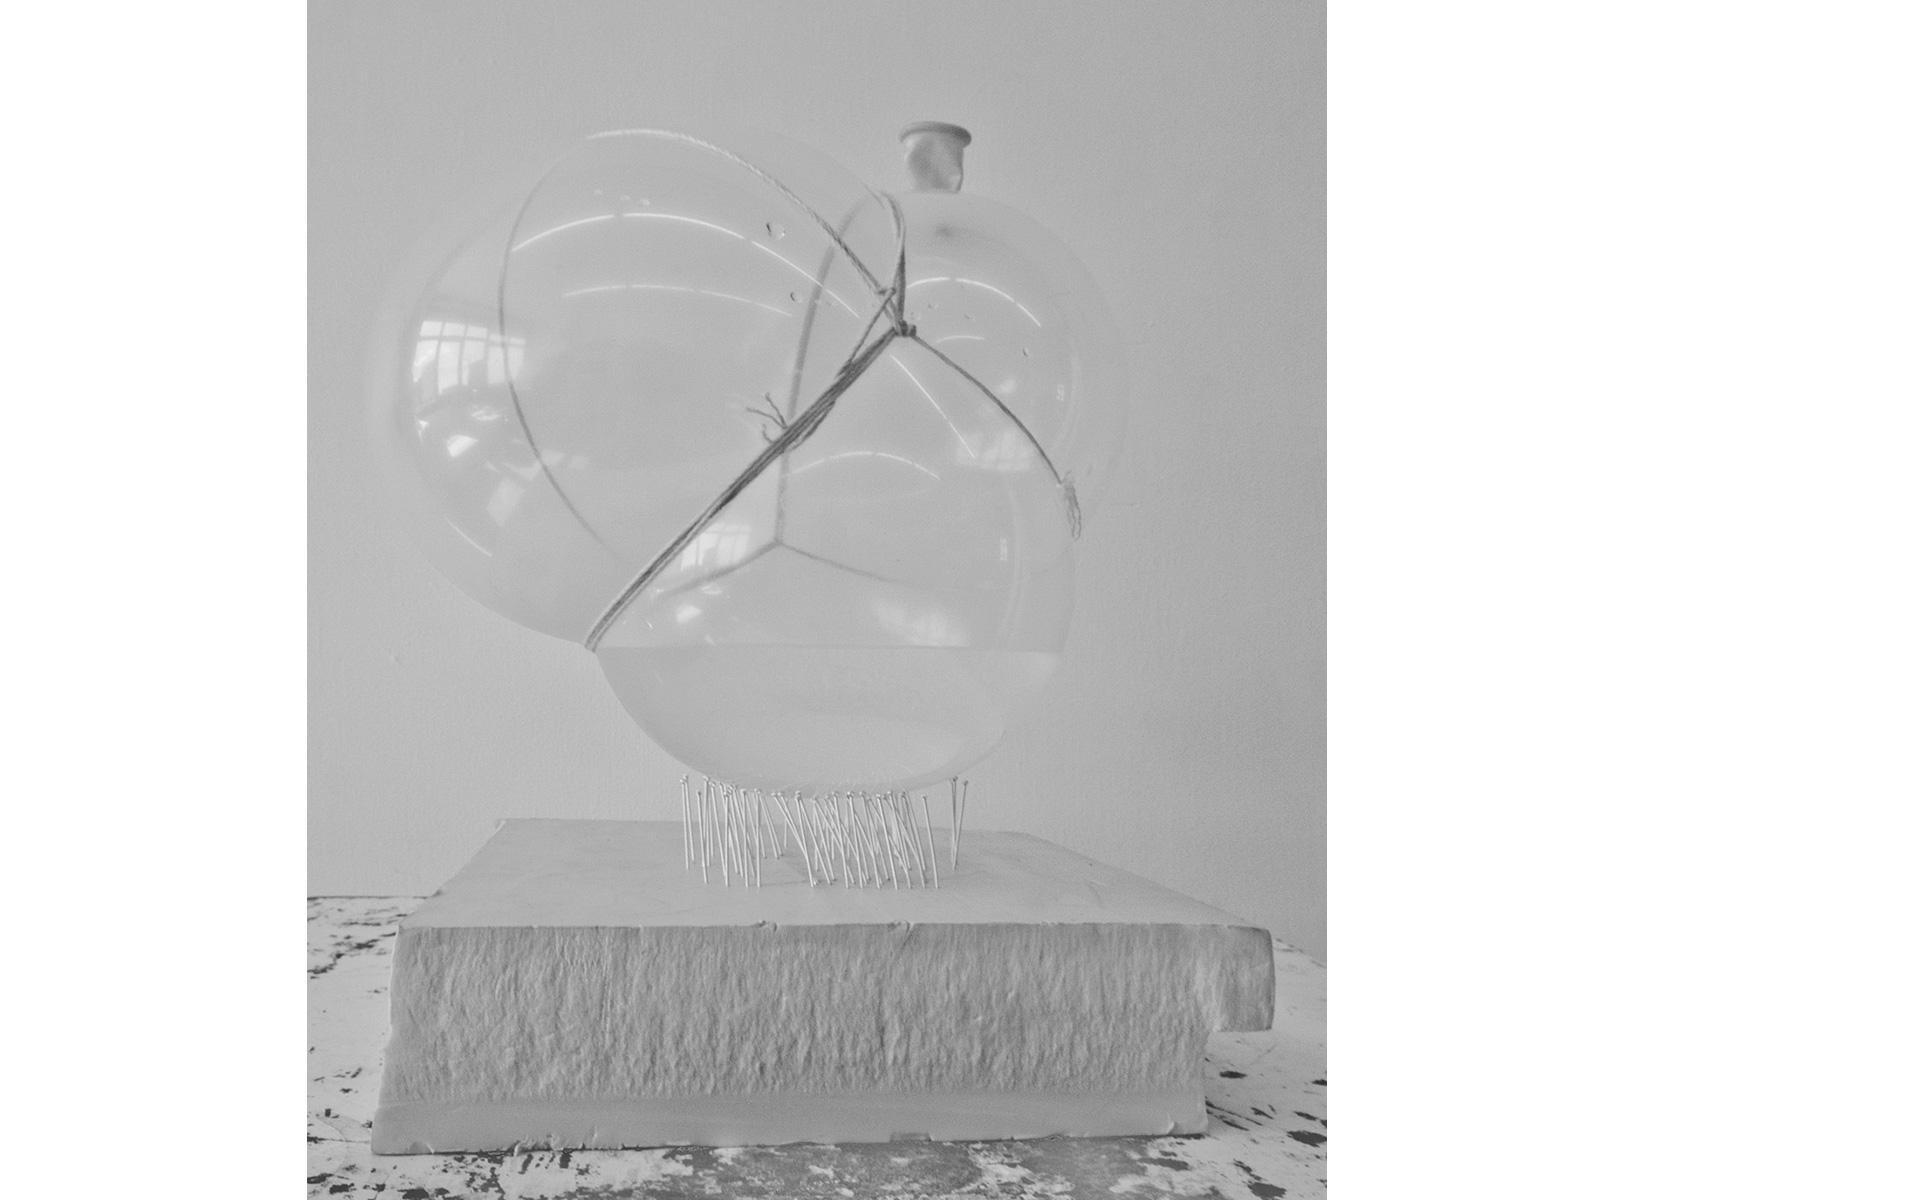 Transparens, vann, balanse / Transparency, Water, Balance